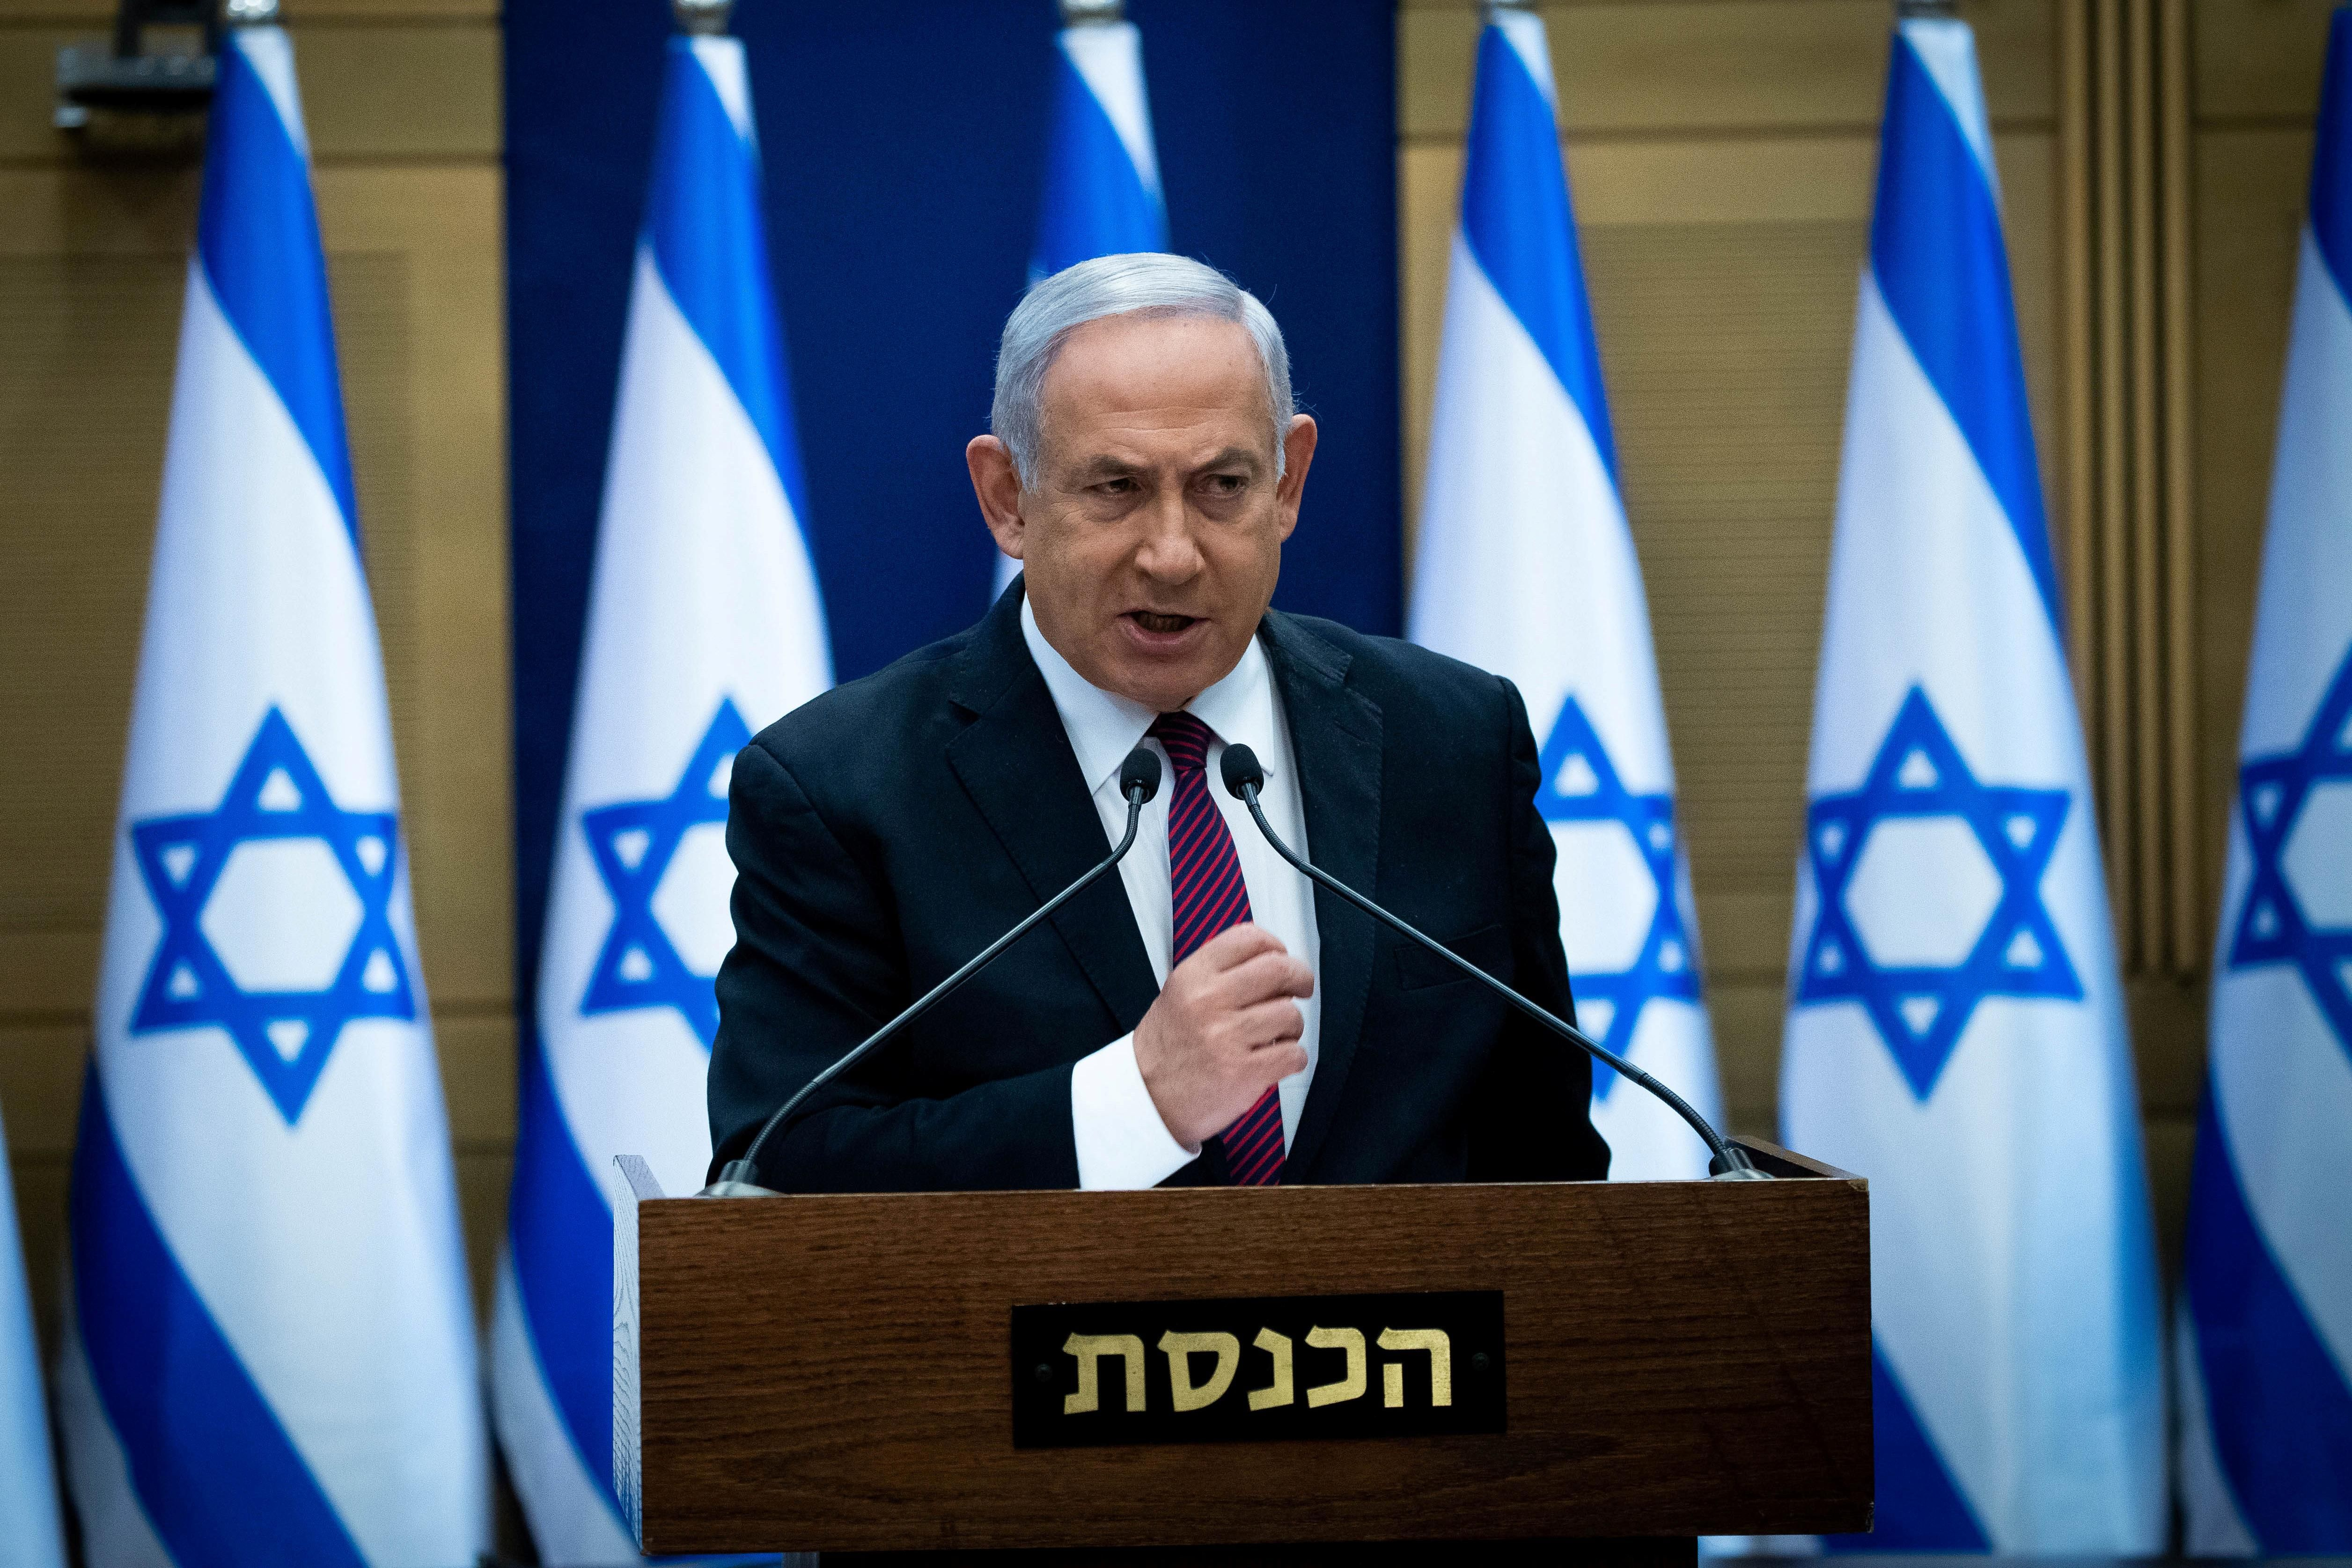 Israeli Prime Minister Benjamin Netanyahu delivers a statement to Likud party MKs at the Knesset (Israel's parliament) in Jerusalem, December 2020.